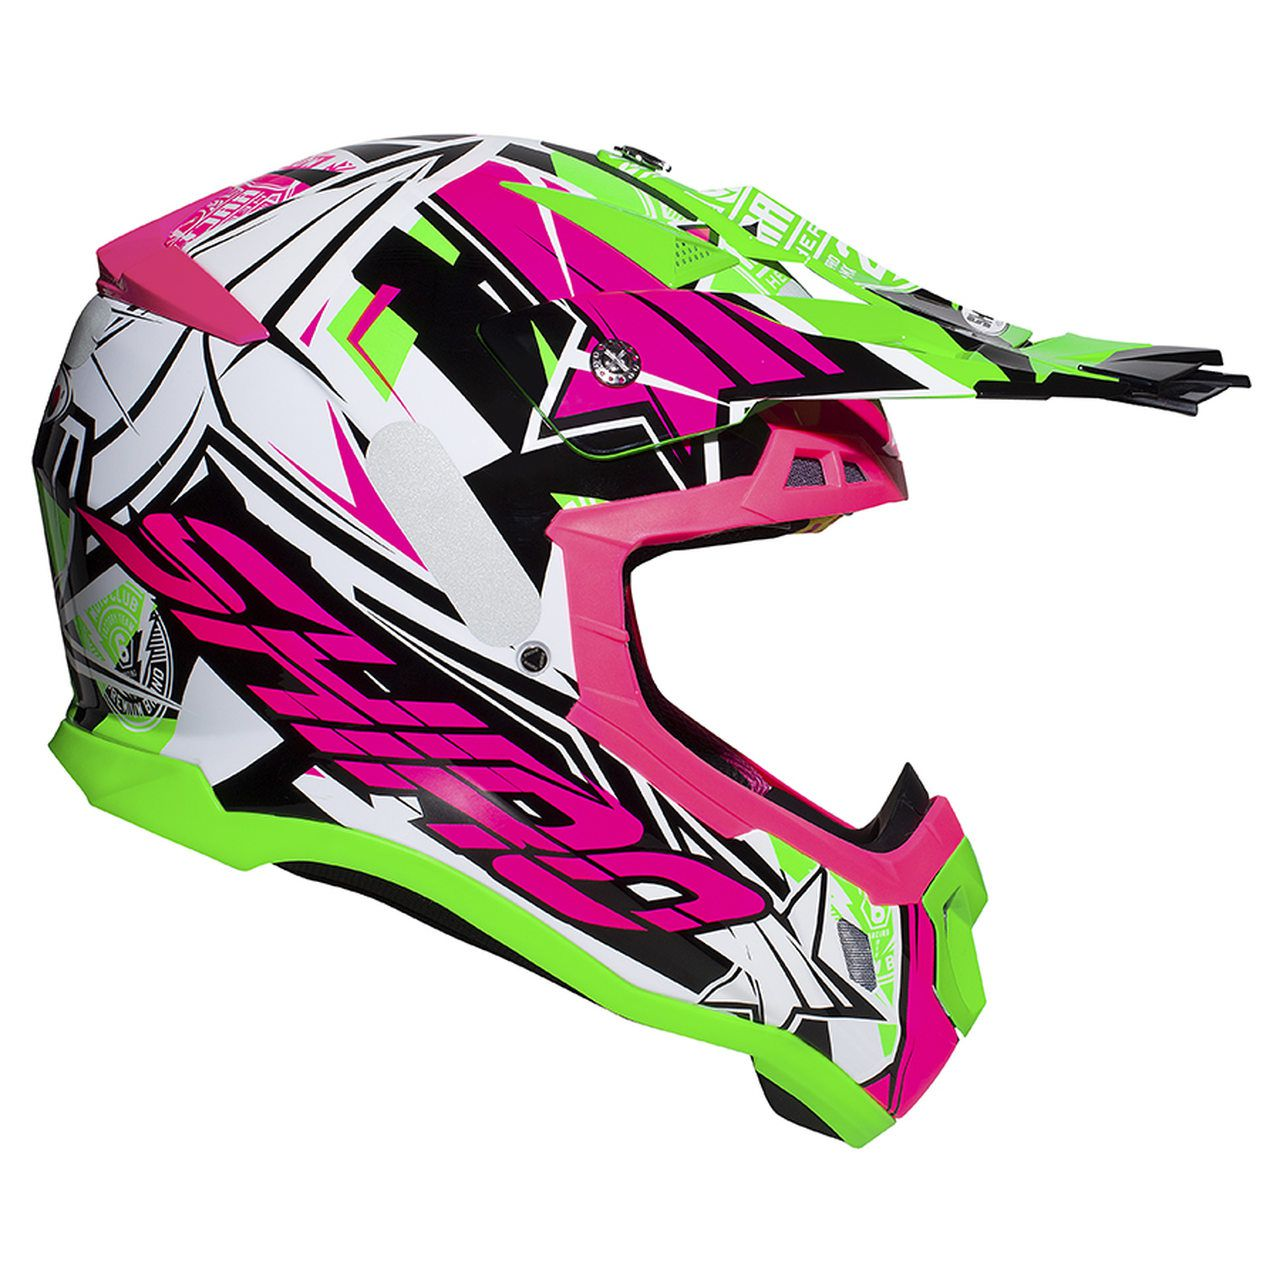 Capacete Shiro Motocross Off Road MX-917 Thunder III Branco Rosa e Verde